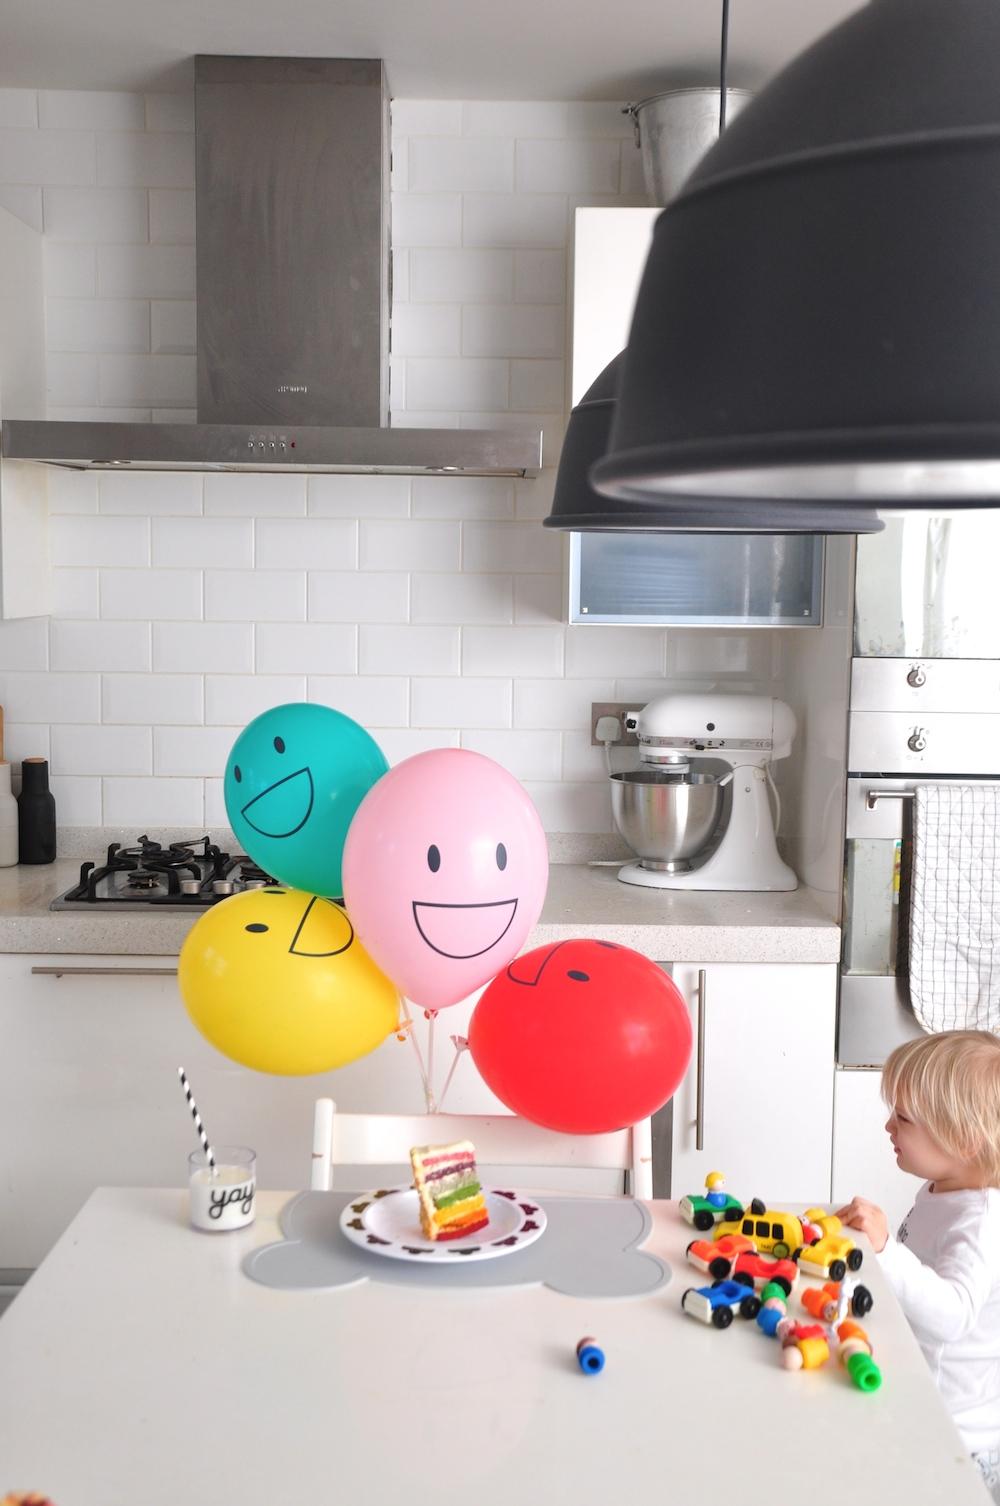 Little_lulubel_oh_happy_fry_rainbow_cake_kitchen